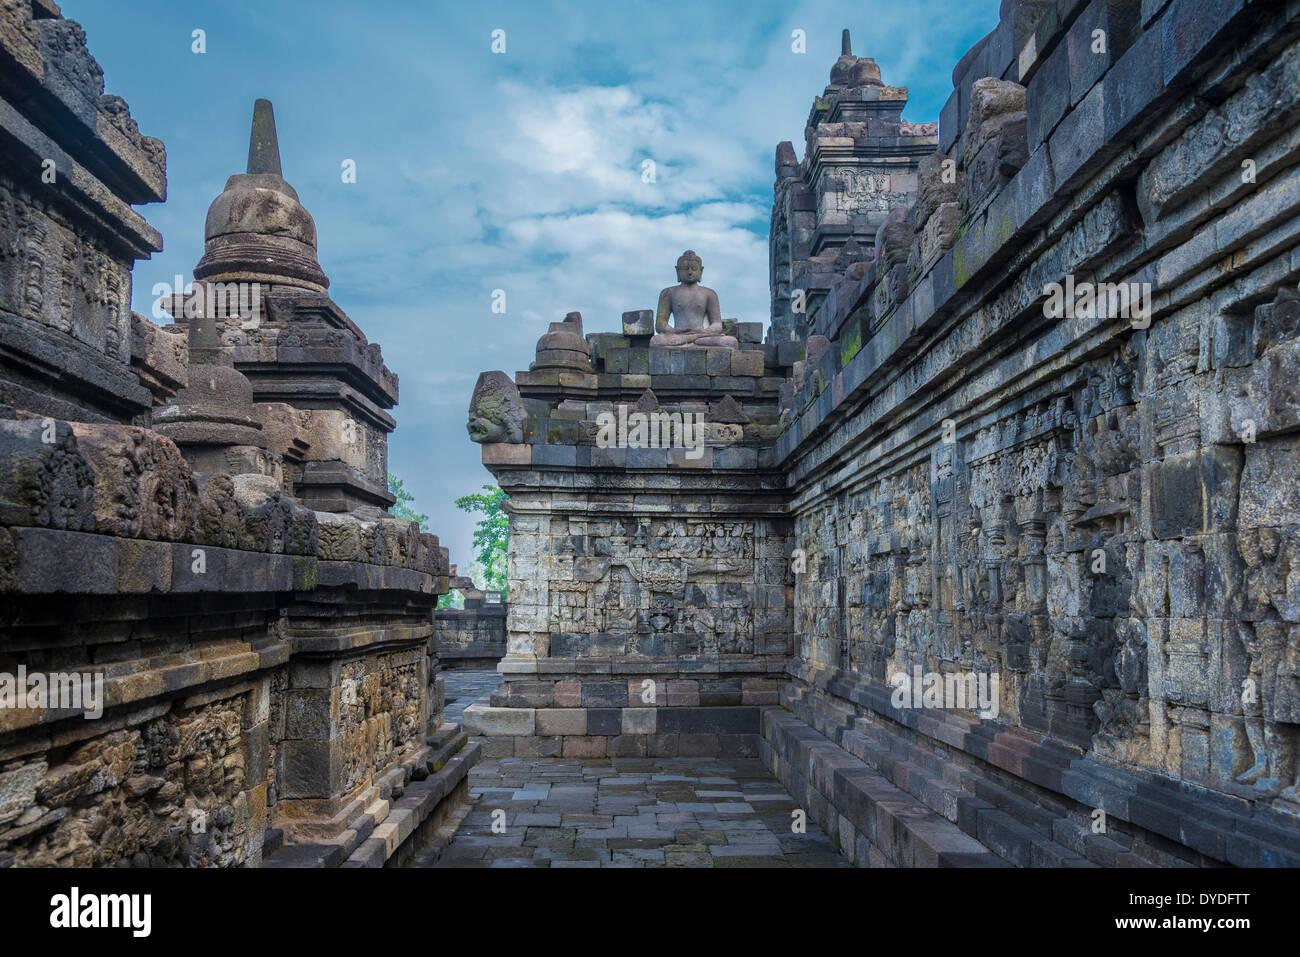 Relieves del templo de Borobudur en Indonesia. Imagen De Stock